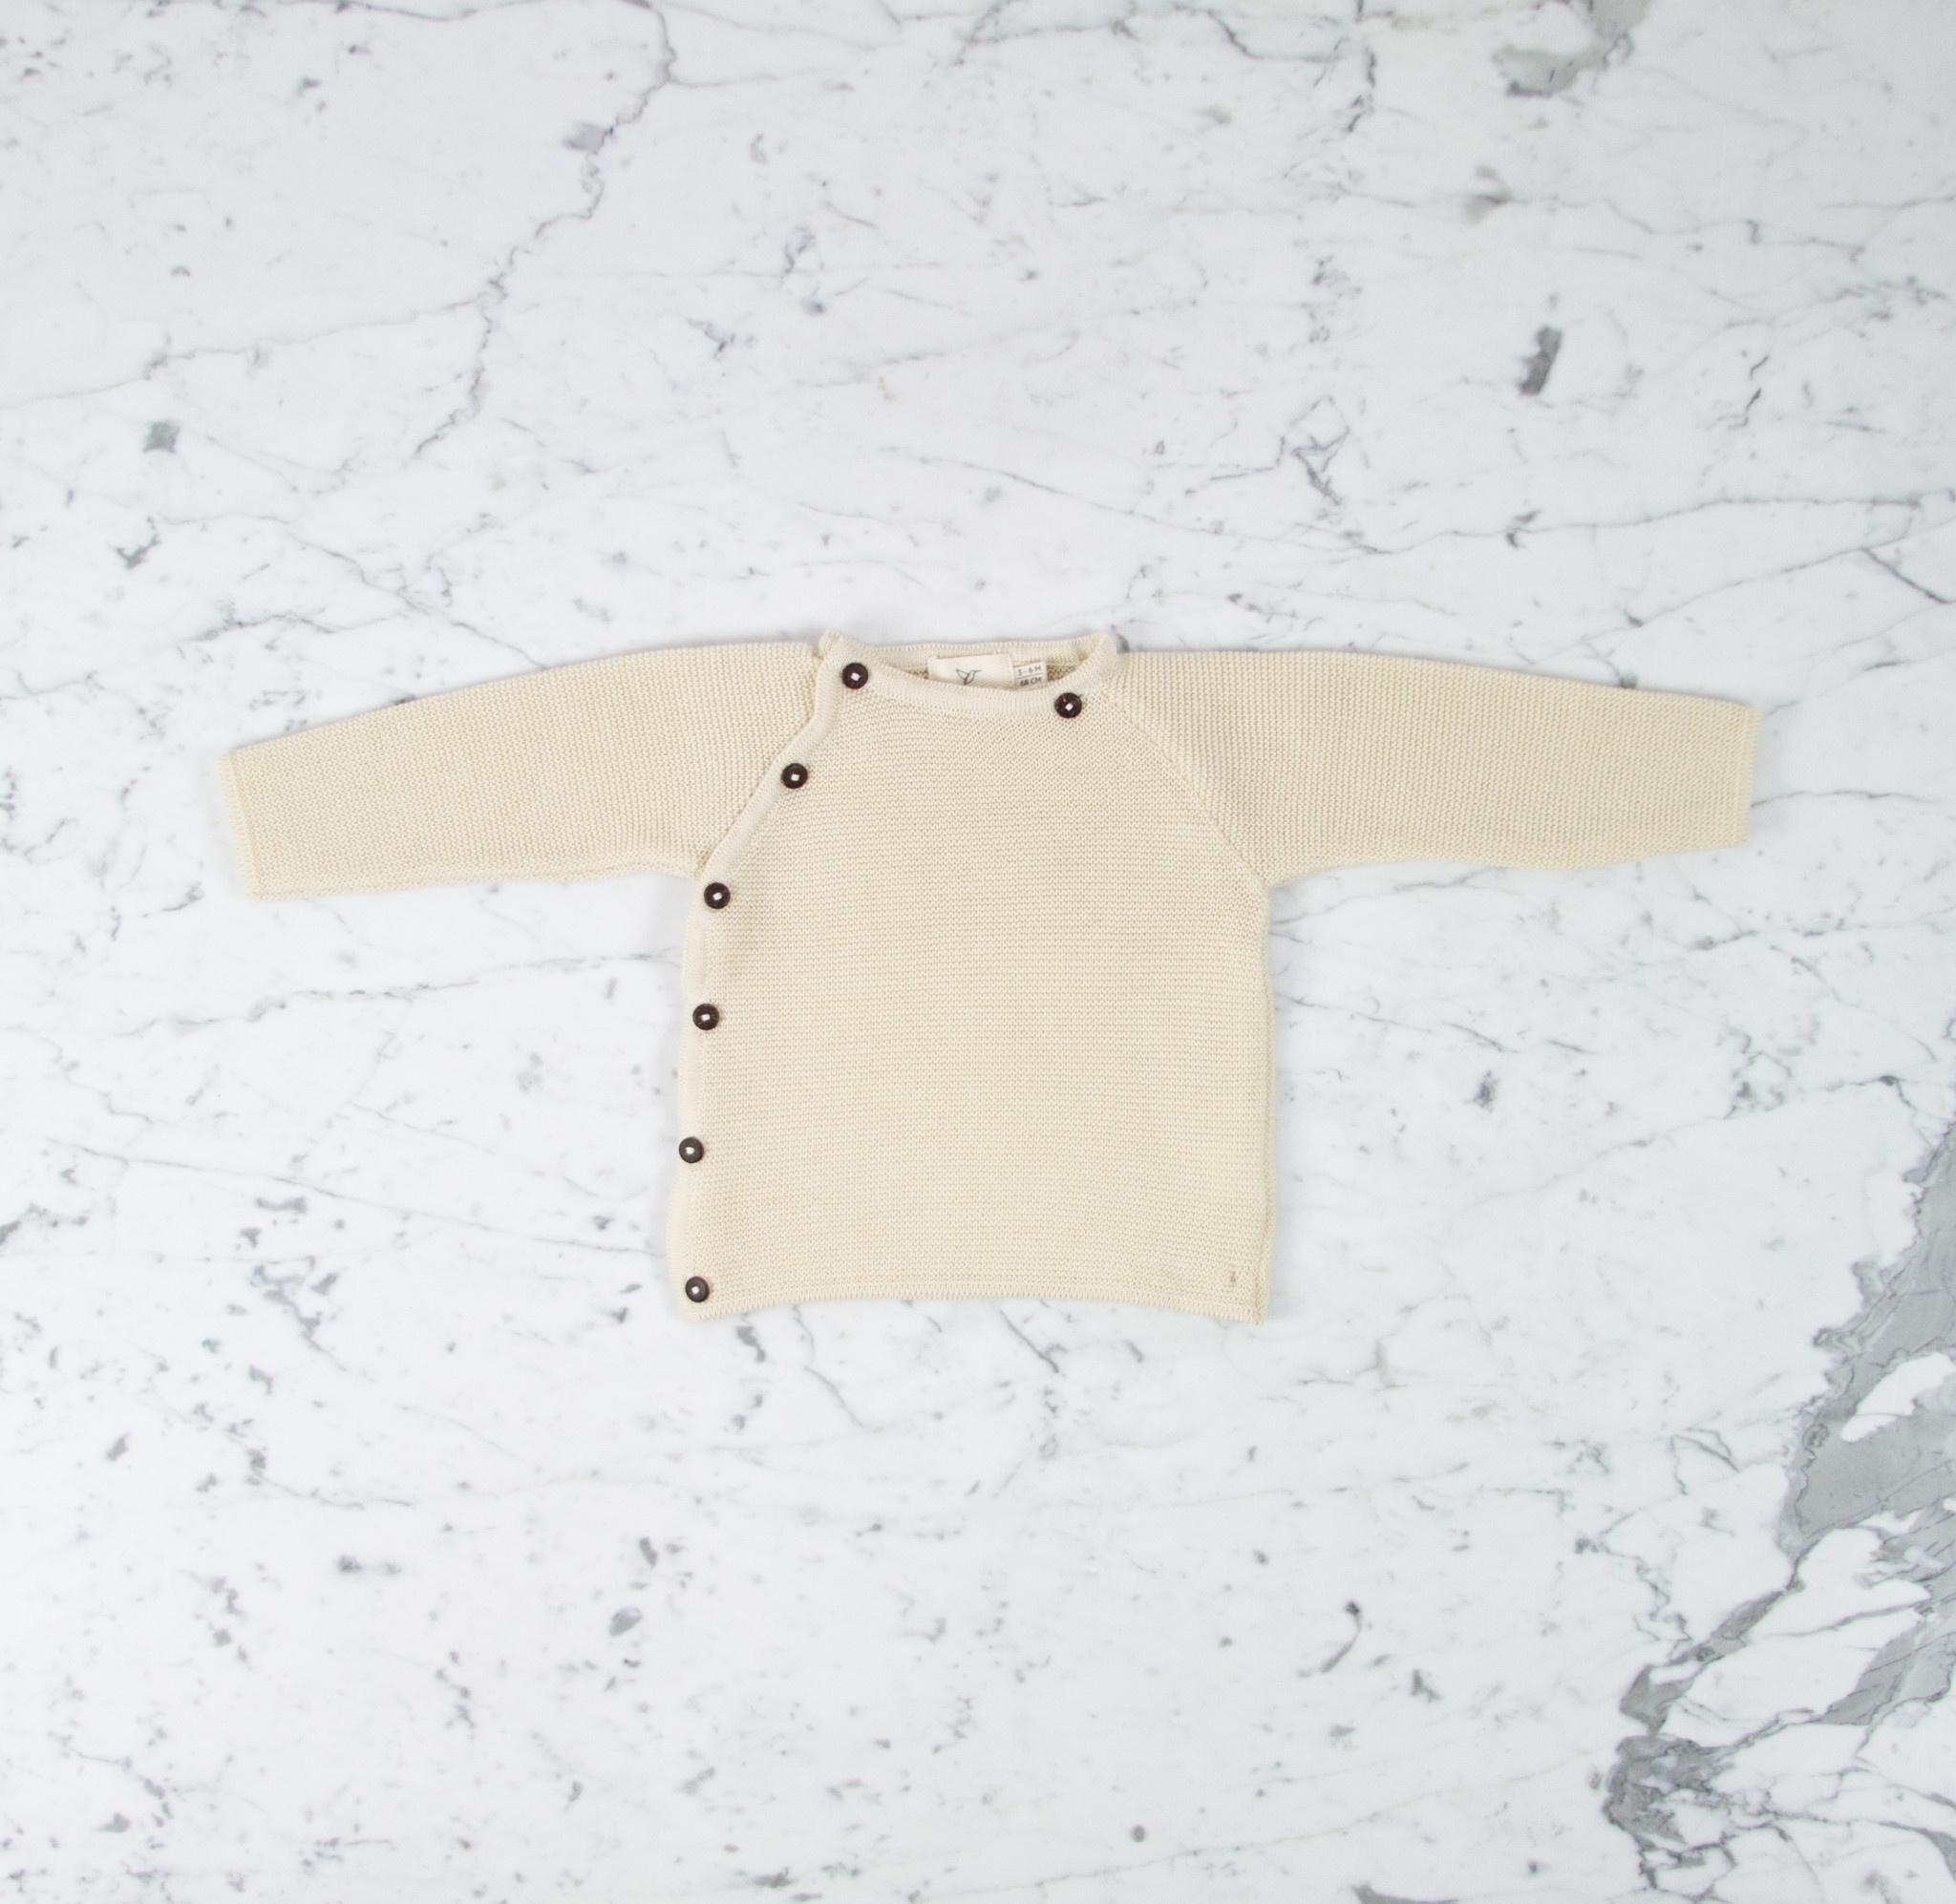 Petit Kolibri Alpaca + Cotton Knit Jacket Sweater - Beige Cream - 3-6 Month